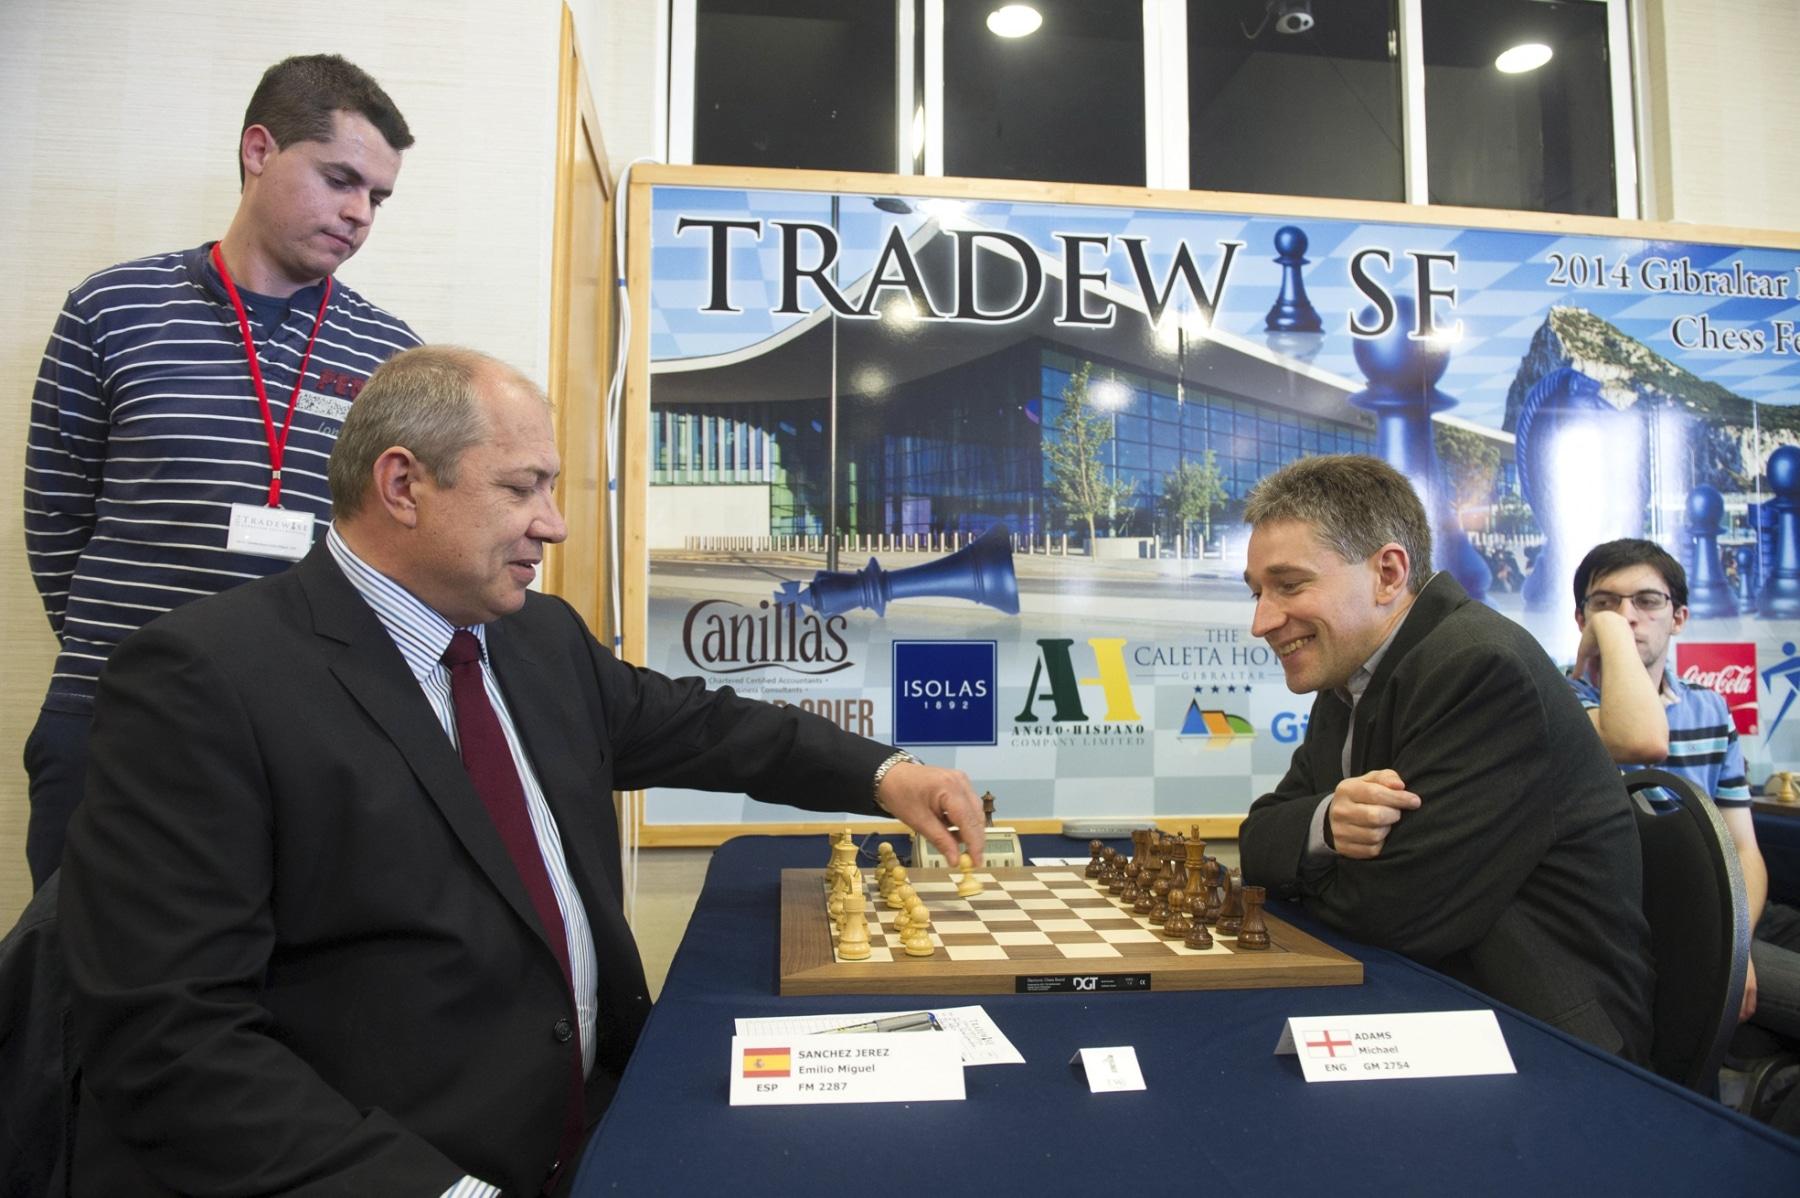 gibraltar-tradewise-chess-festival_004_12193762704_o